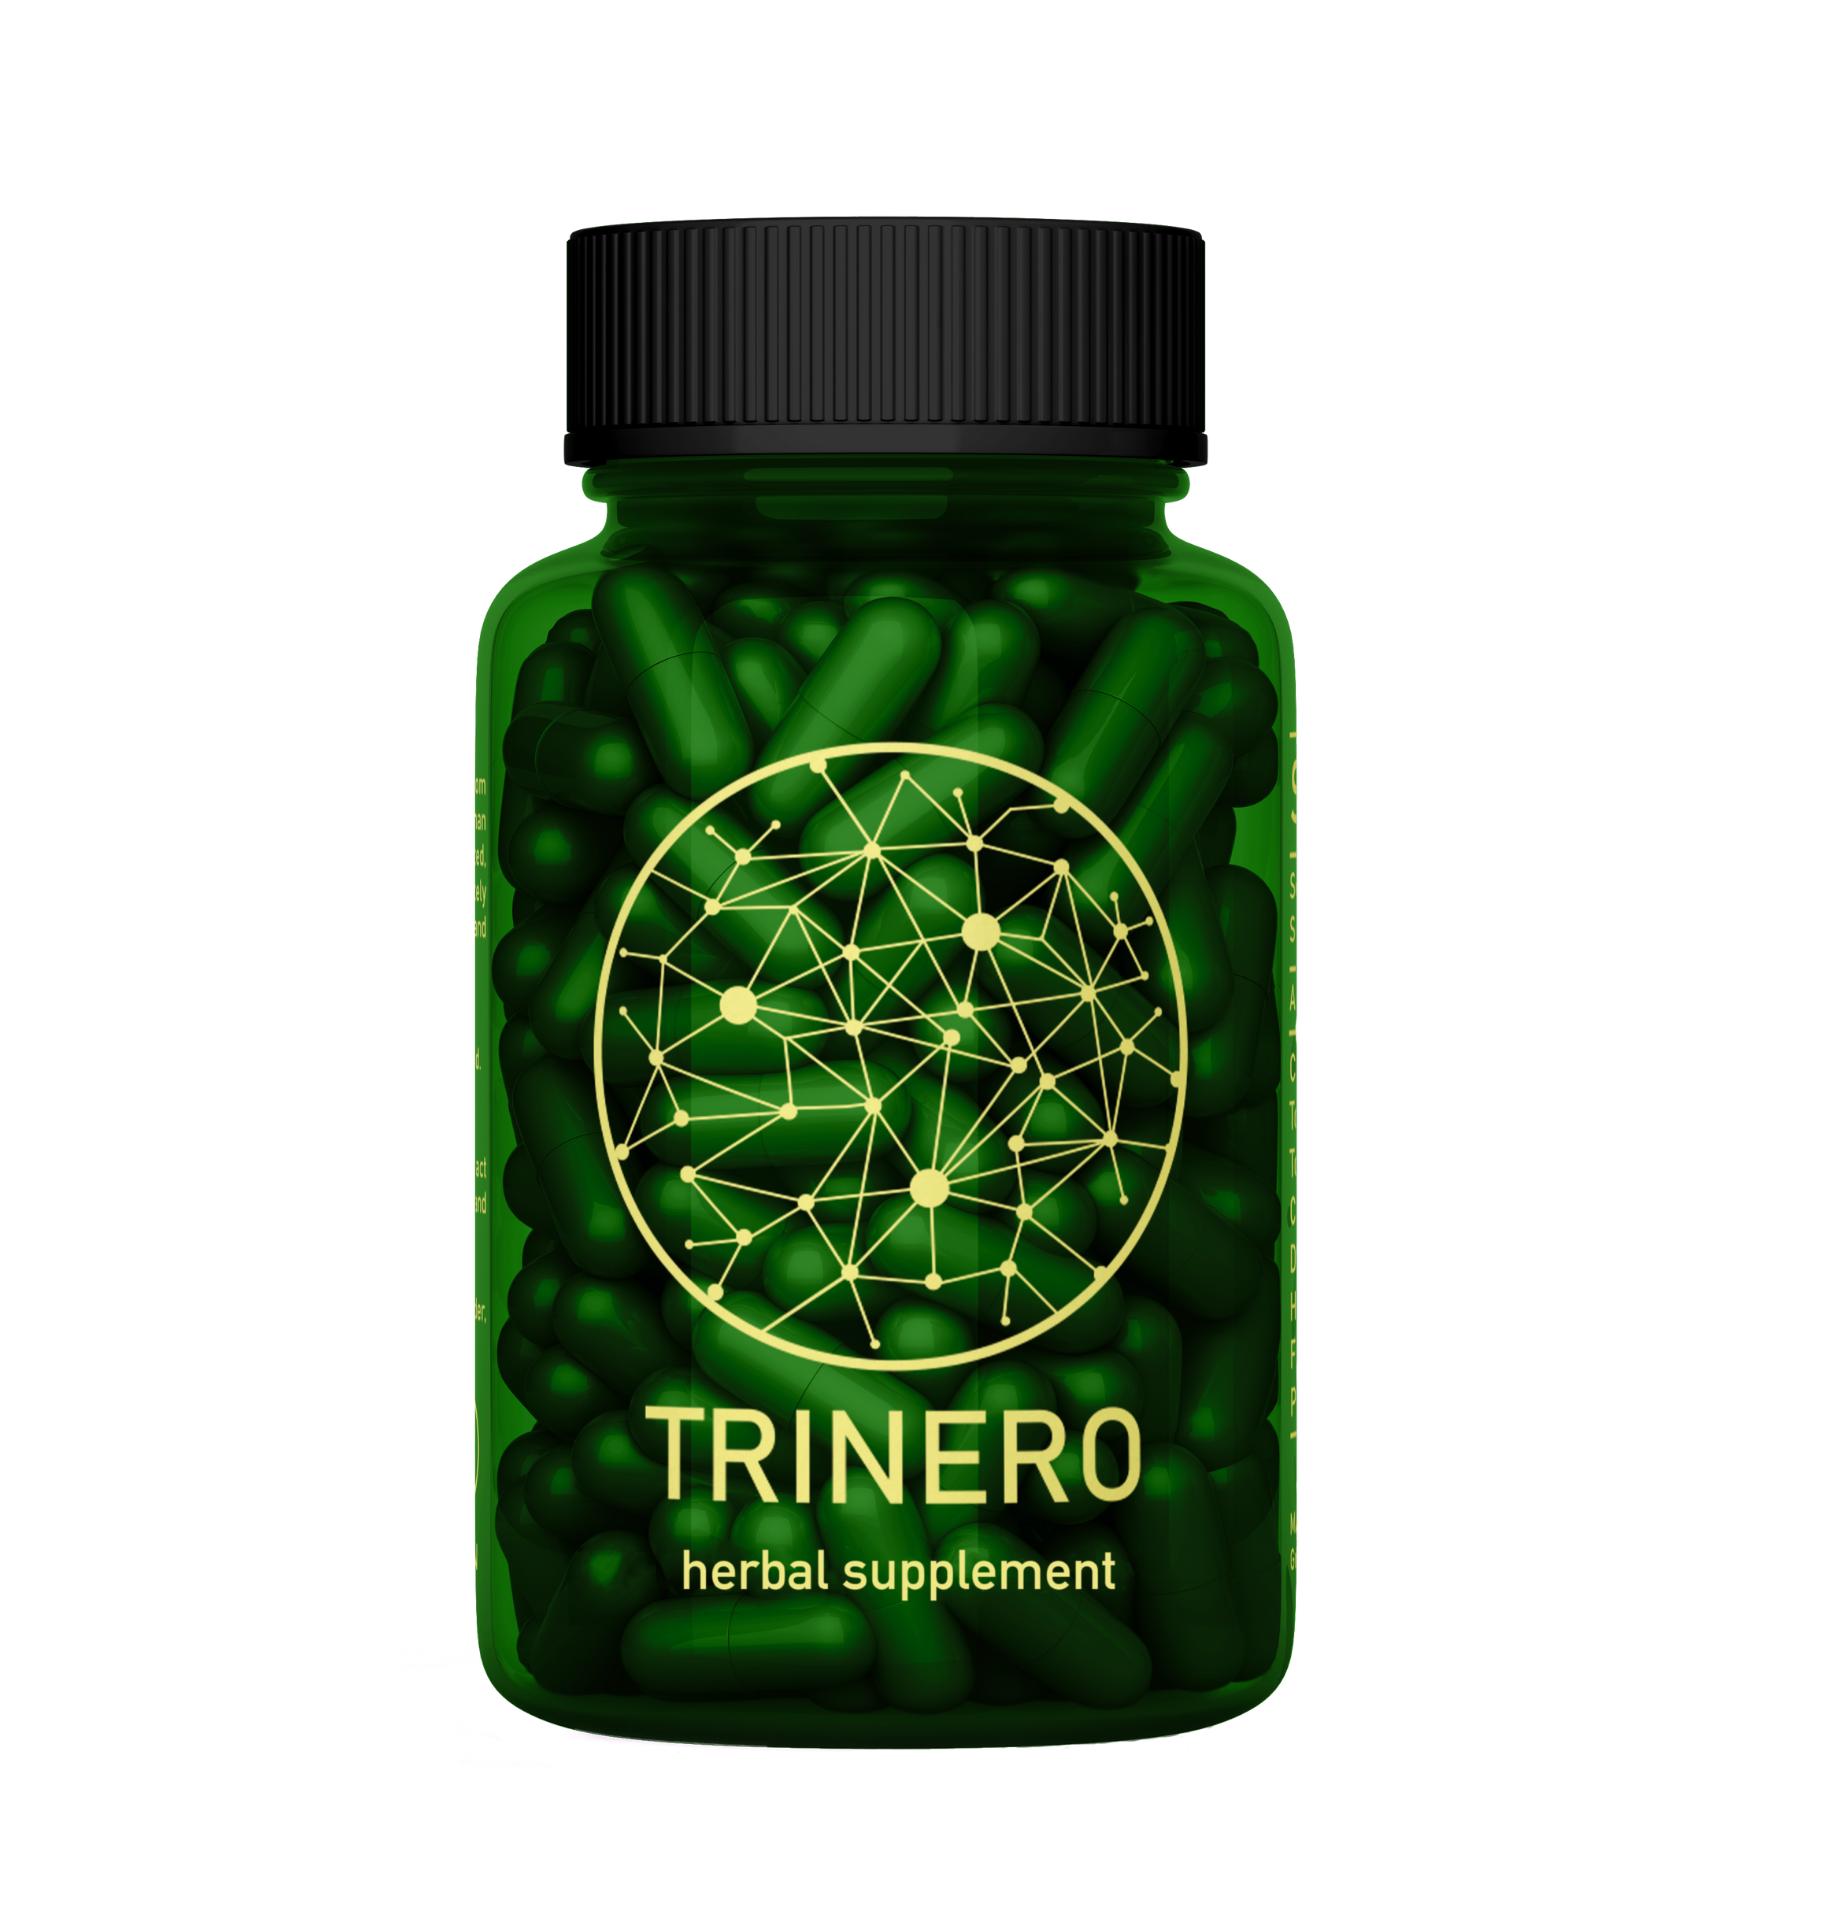 trinero 60 kapslit, 30g (2889)